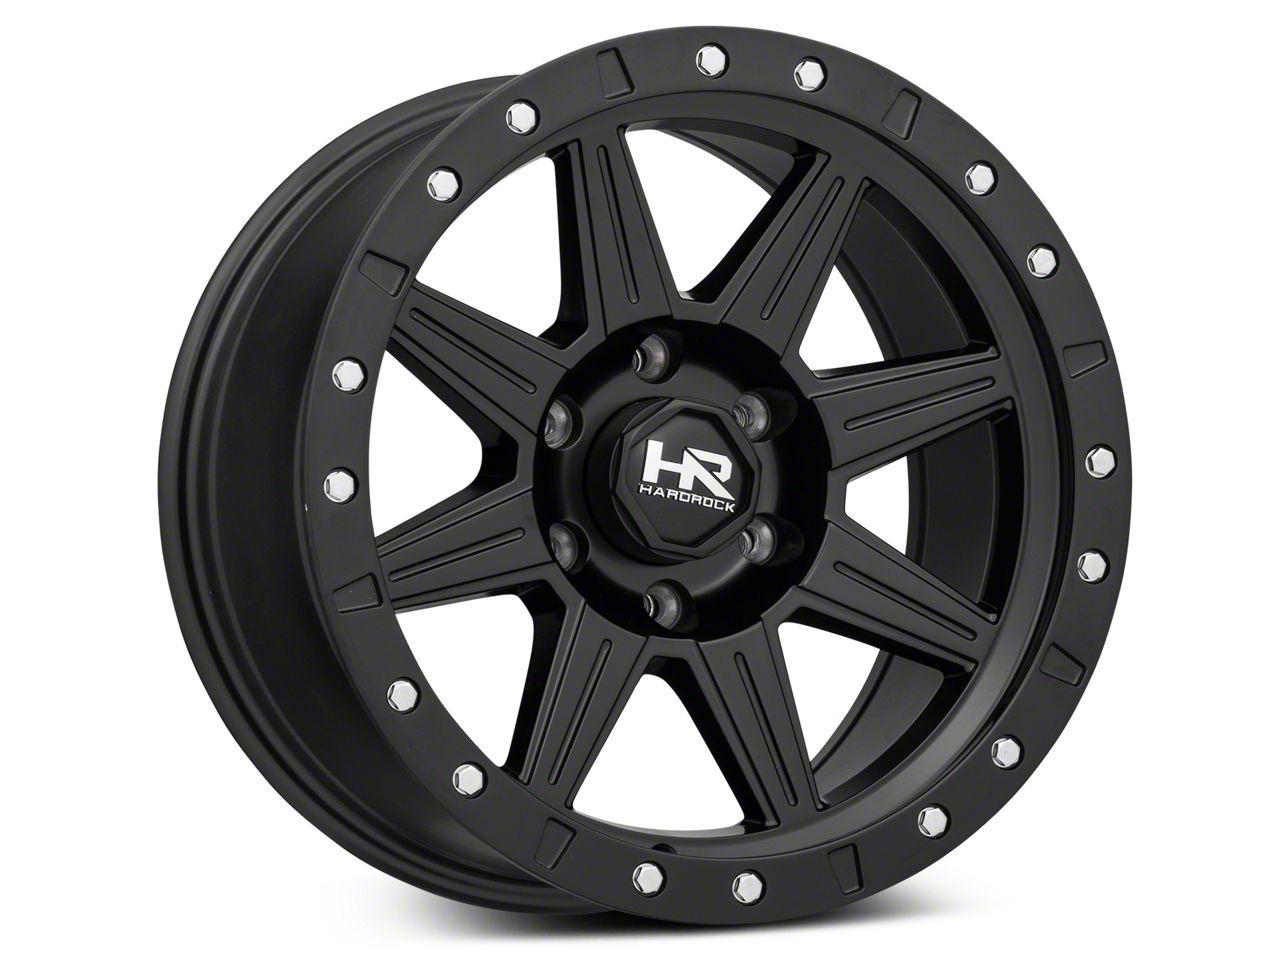 Hardrock Offroad H100 Matte Black 6-Lug Wheel - 17x8.5 (99-18 Silverado 1500)